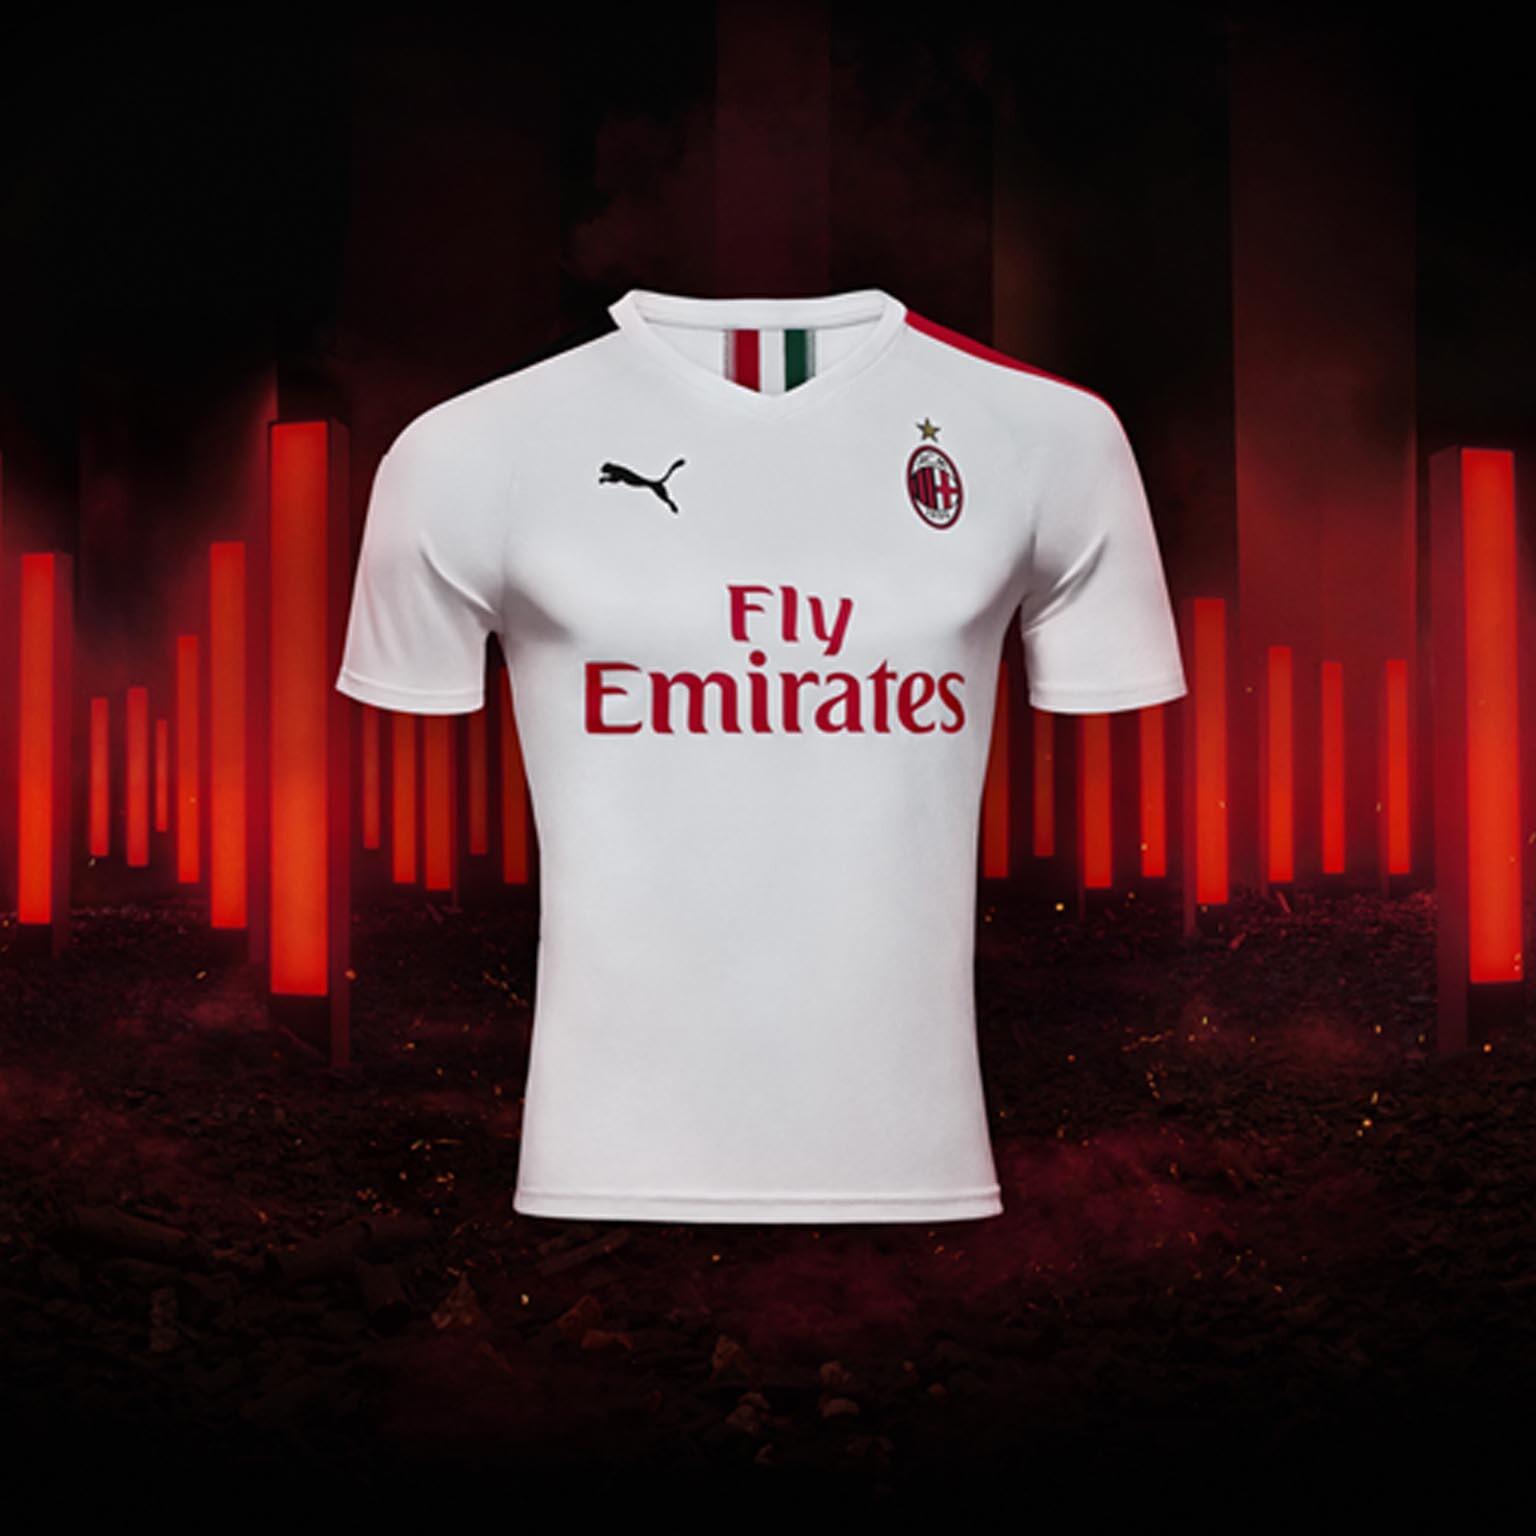 784ee5ff381 PUMA AC Milan | AC Milan Jerseys, Kits, Teamwear, Fanwear and more